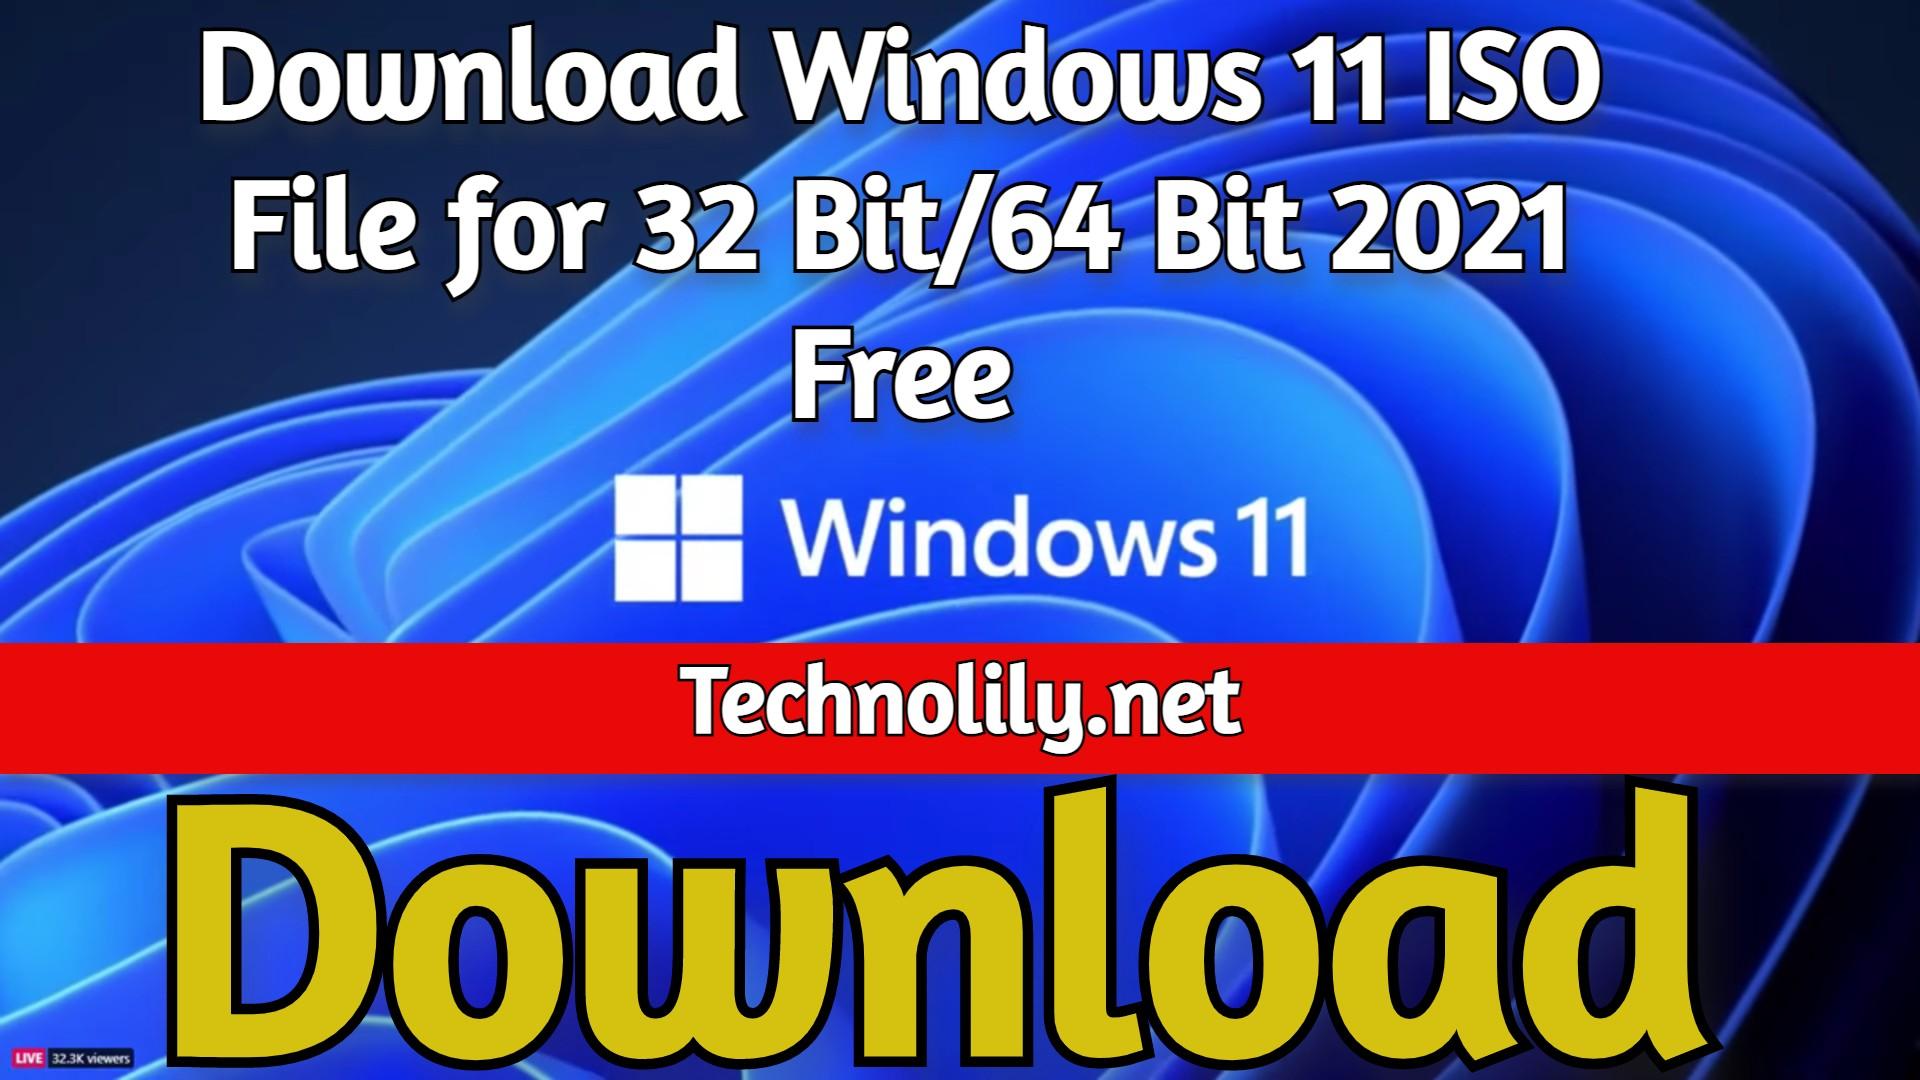 Download Windows 11 ISO File for 32 Bit/64 Bit 2021 Free